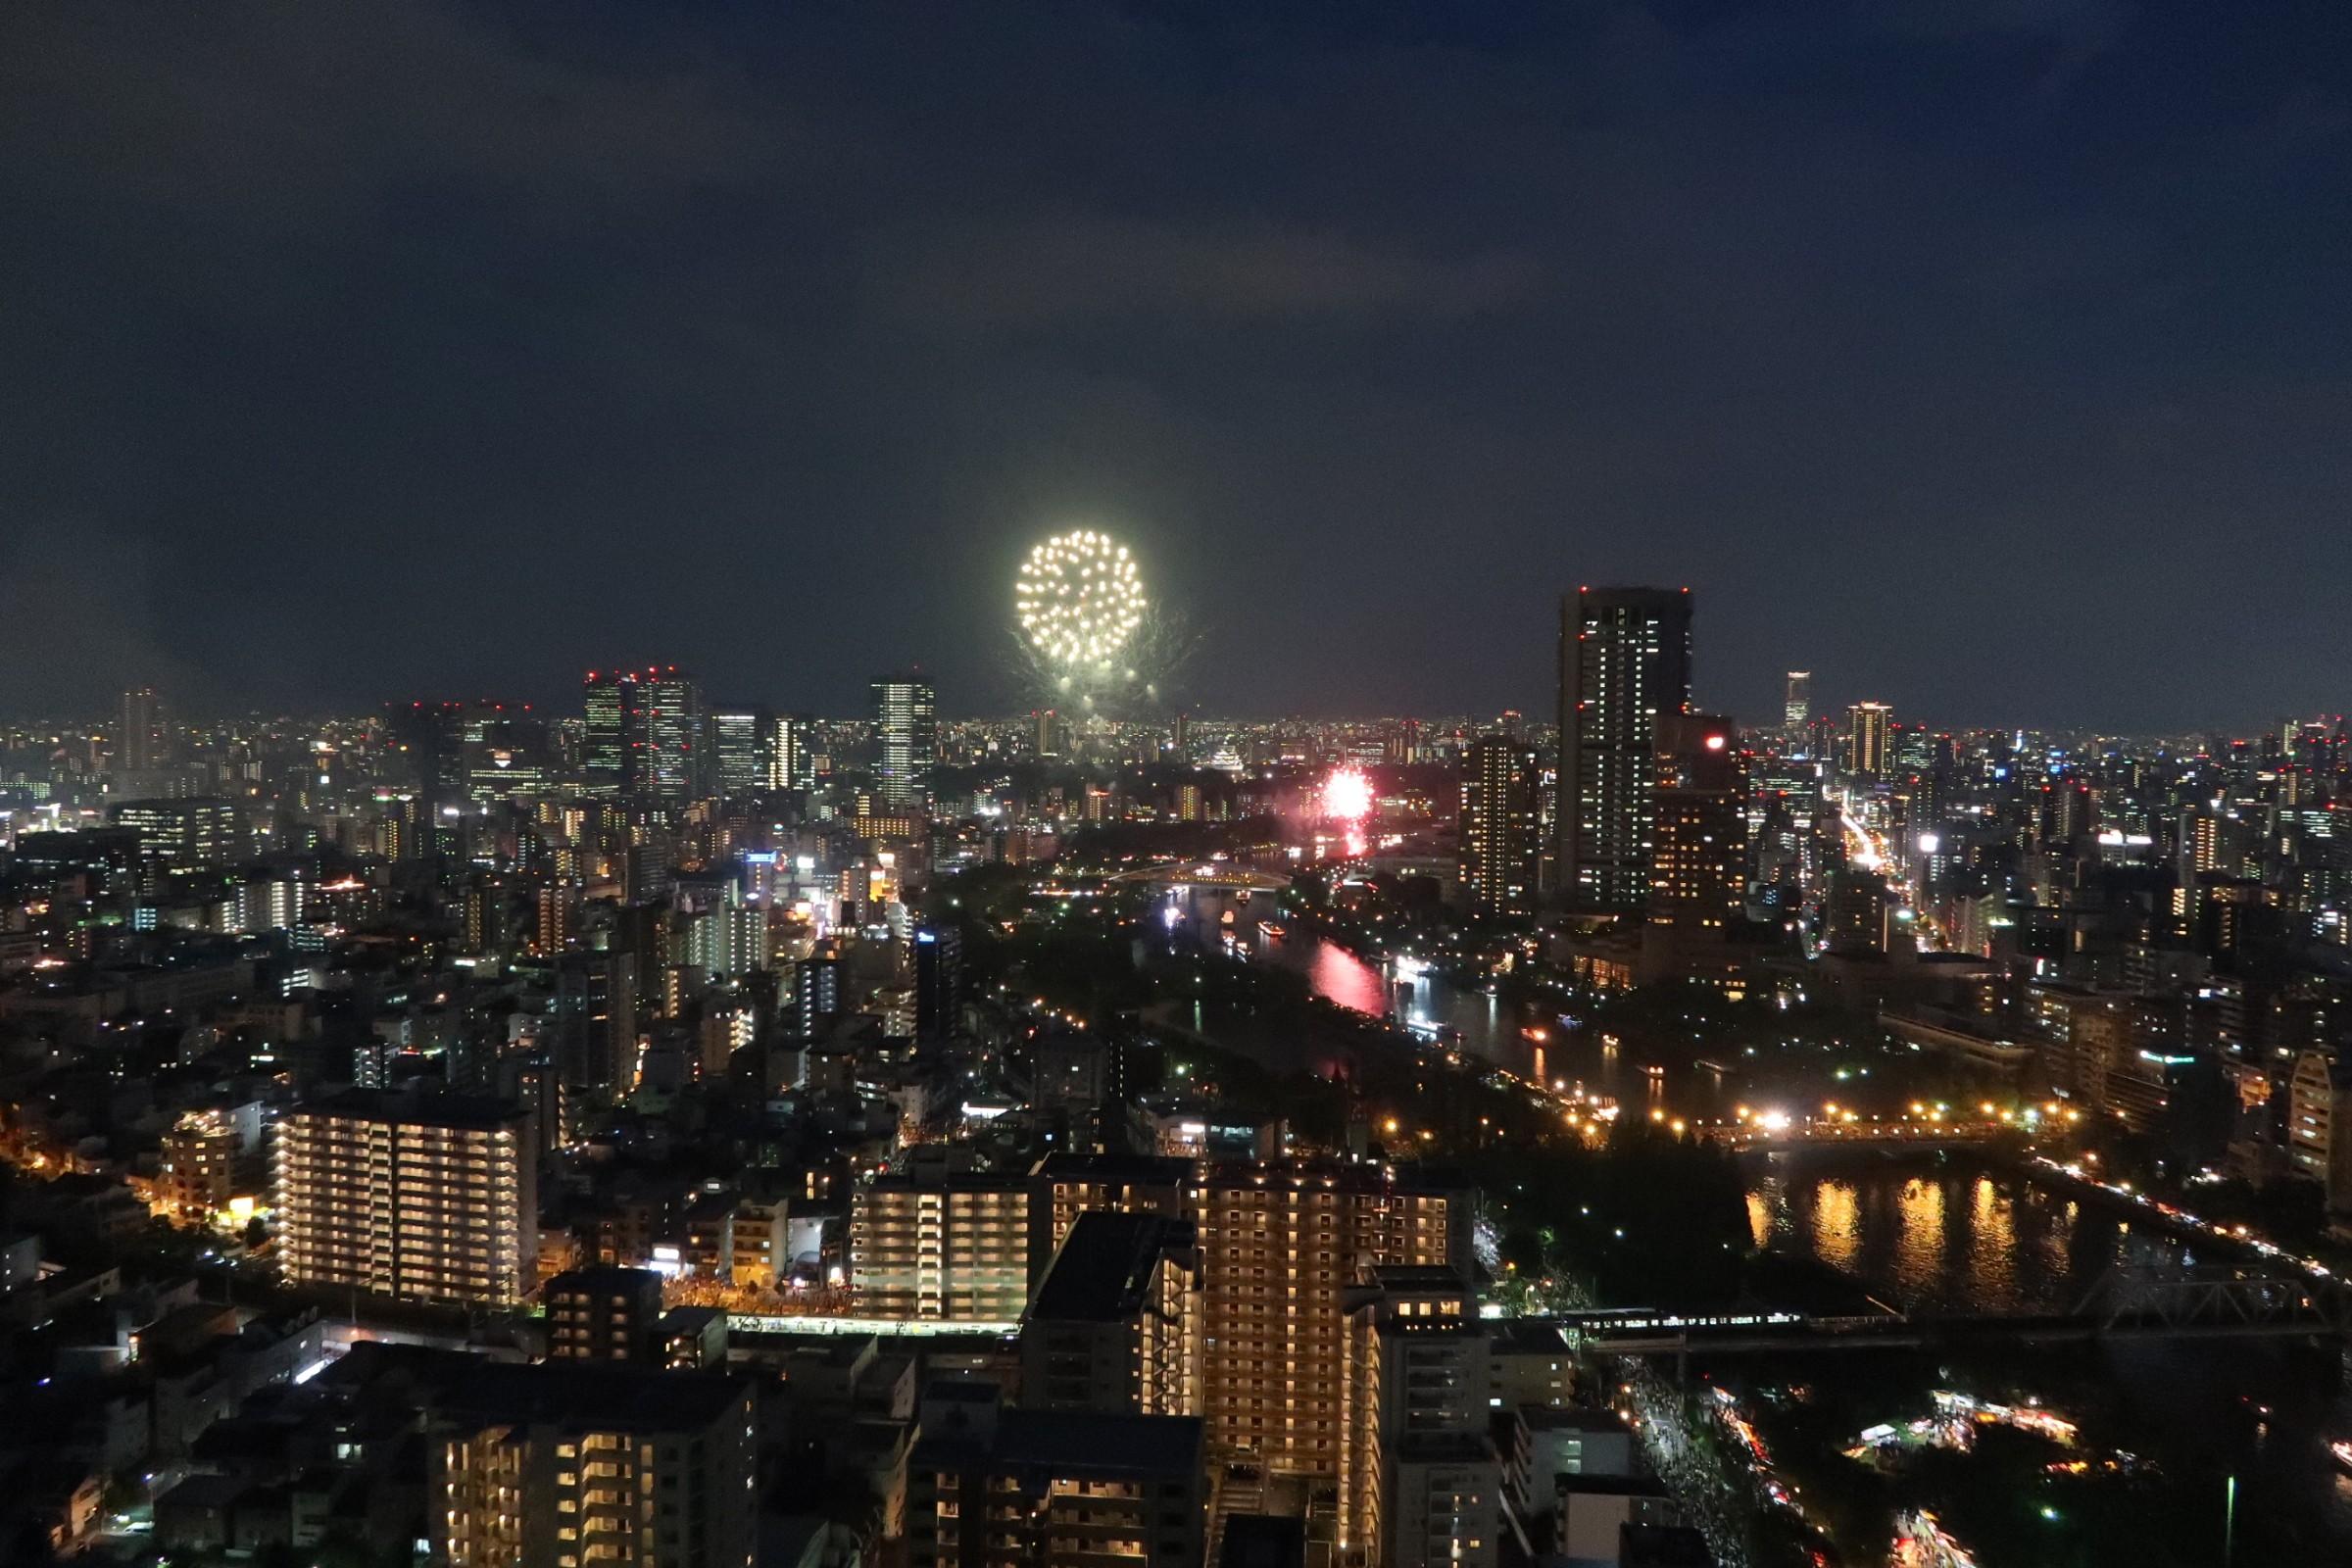 f:id:kyosuk:20190727185318j:image